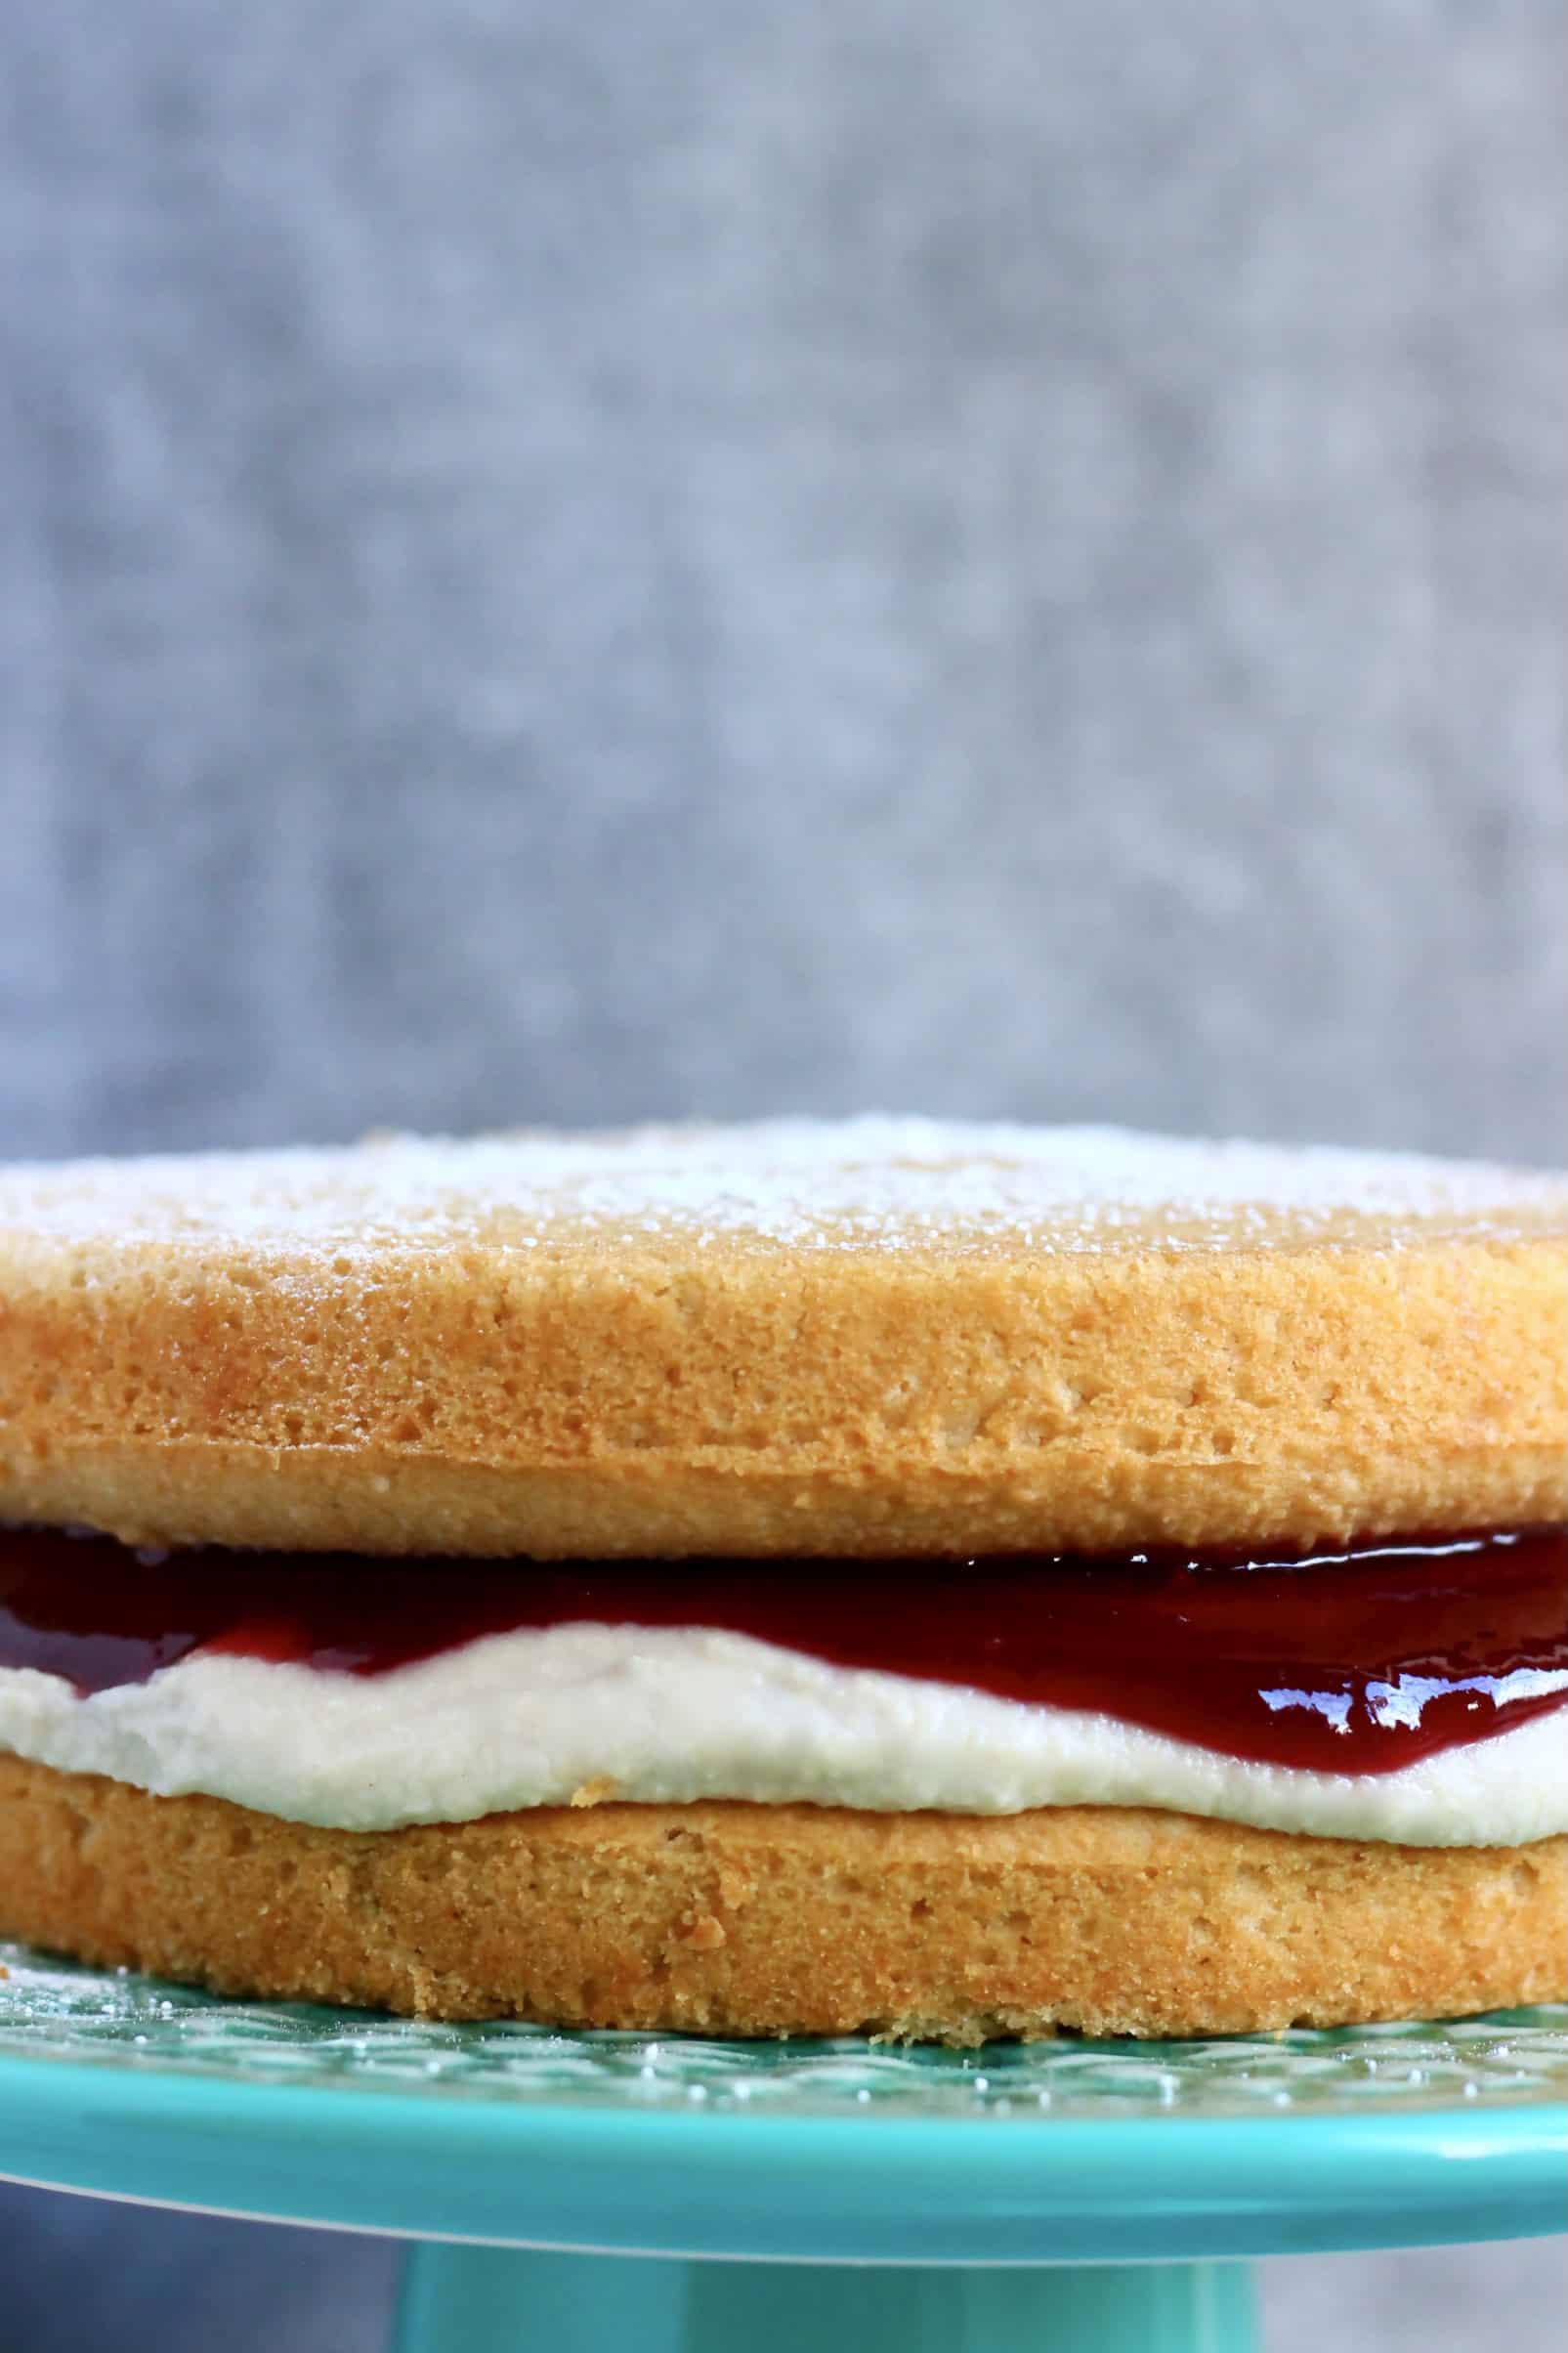 A gluten-free vegan Victoria sponge cake with vegan buttercream and raspberry jam on a cake stand